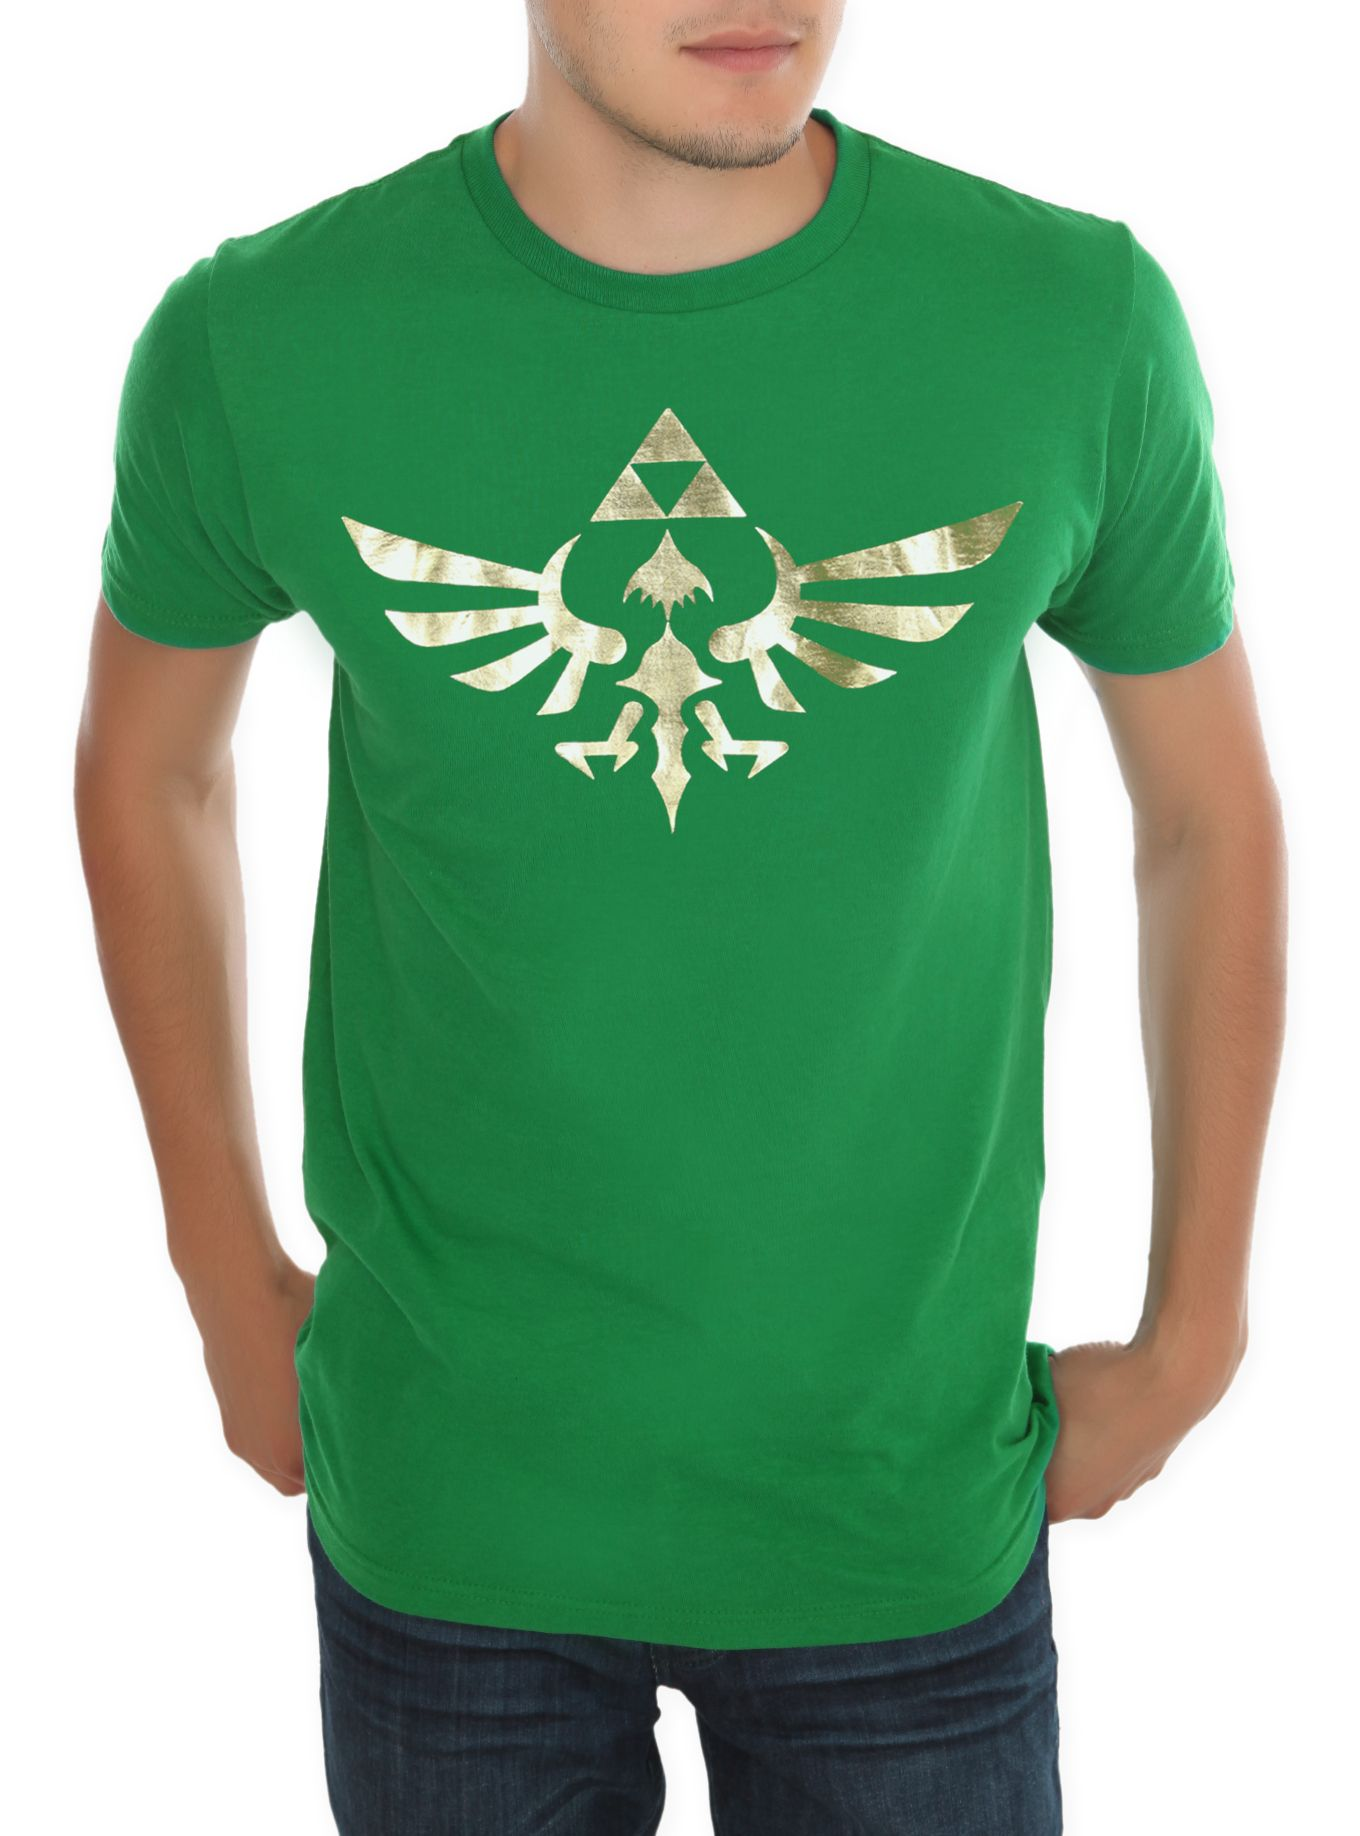 ce8fe37dd Nintendo The Legend Of Zelda Gold Triforce T-Shirt | Tees Tees Tees ...